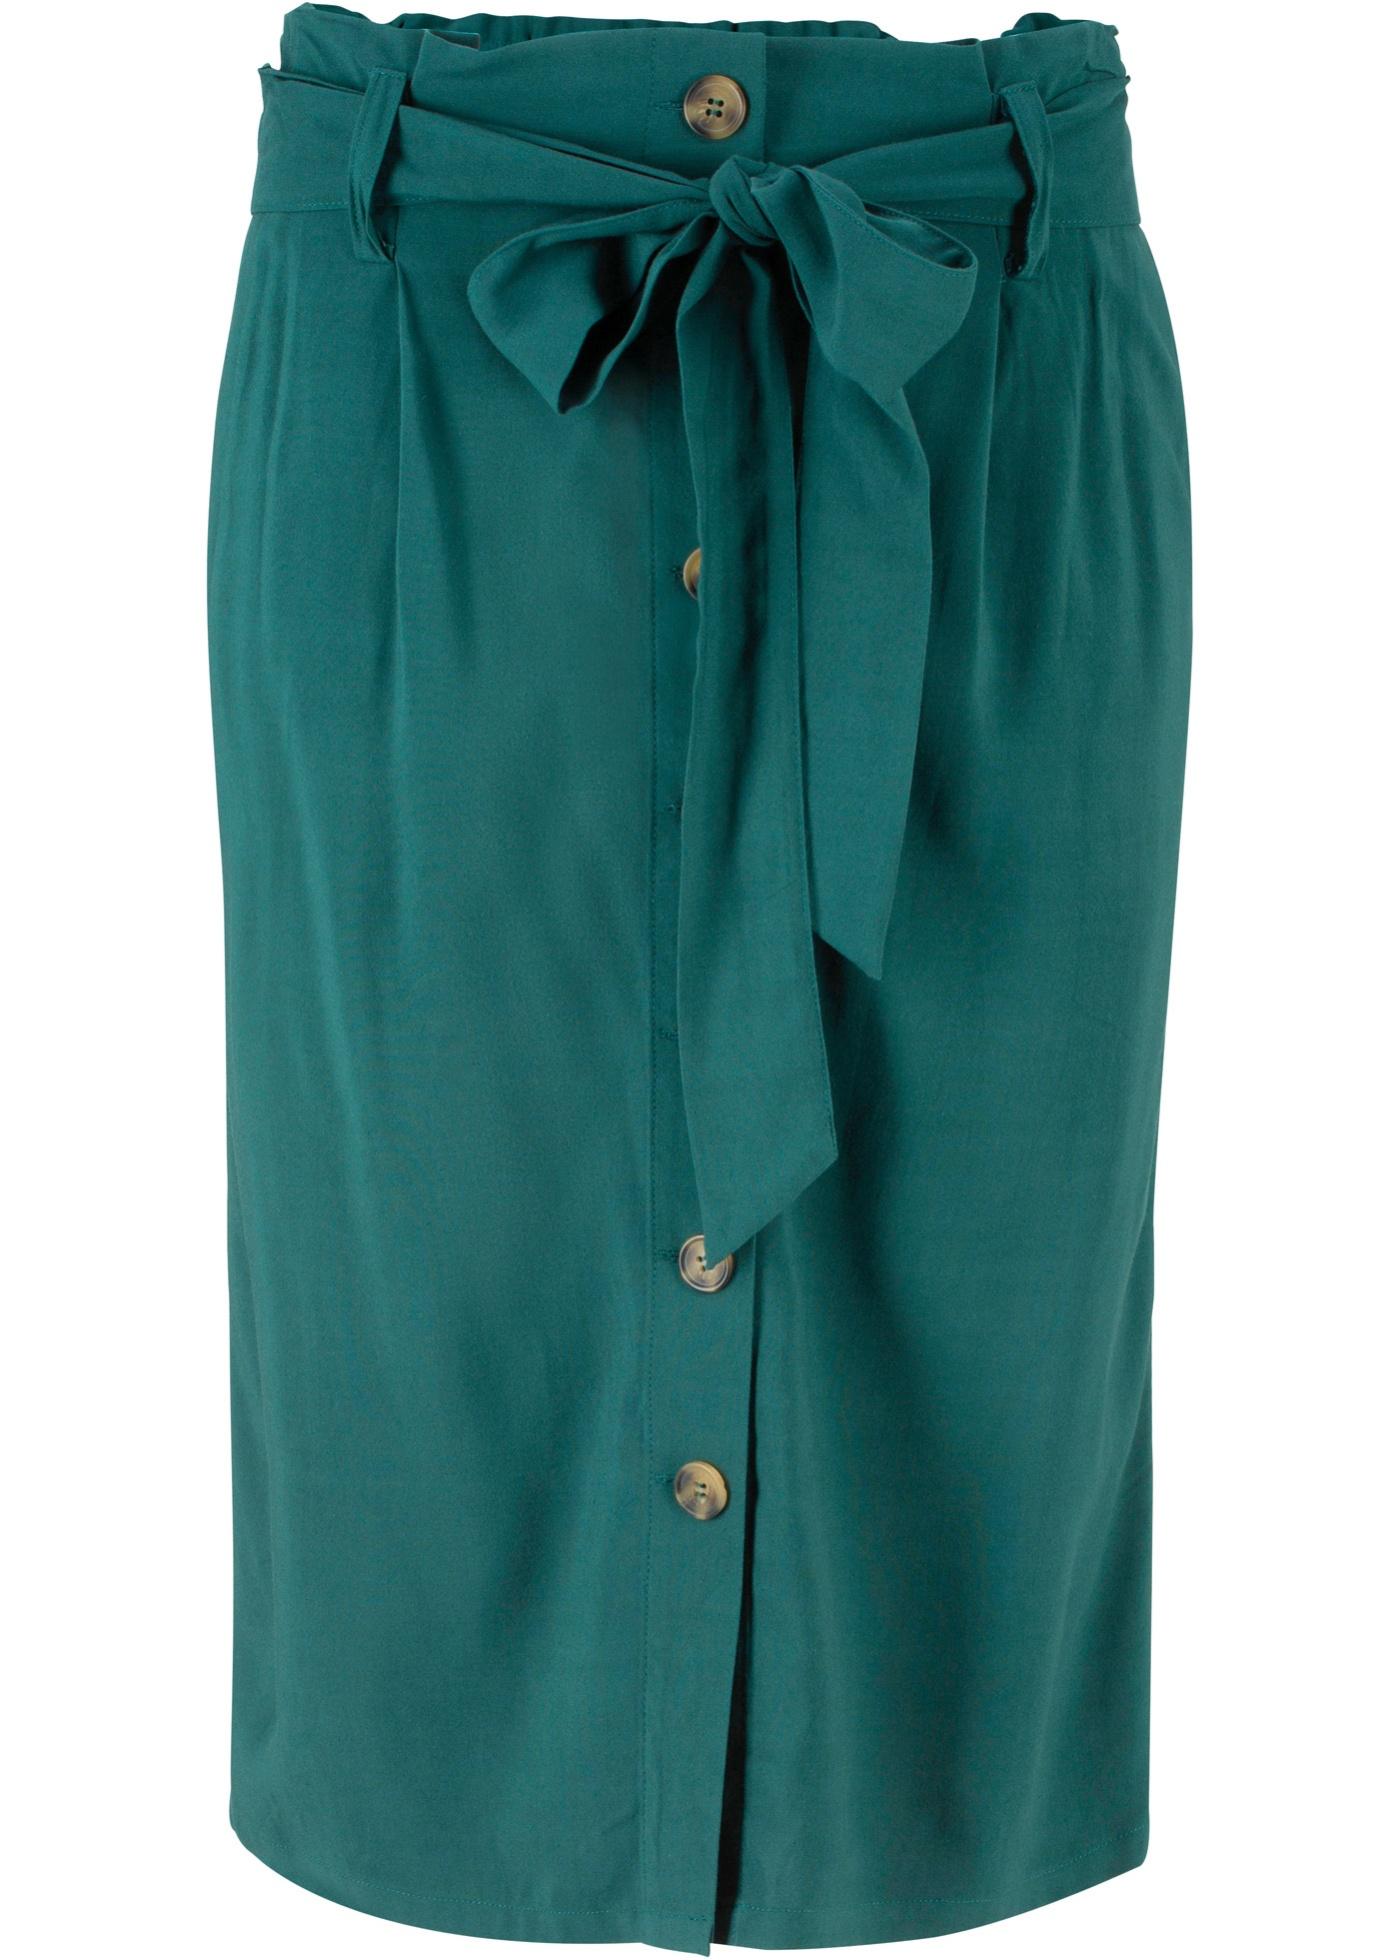 CollectionJupe Kelly Bpc Pour Style Paperbag Femme Bonprix Maite Vert tsCorQhdxB